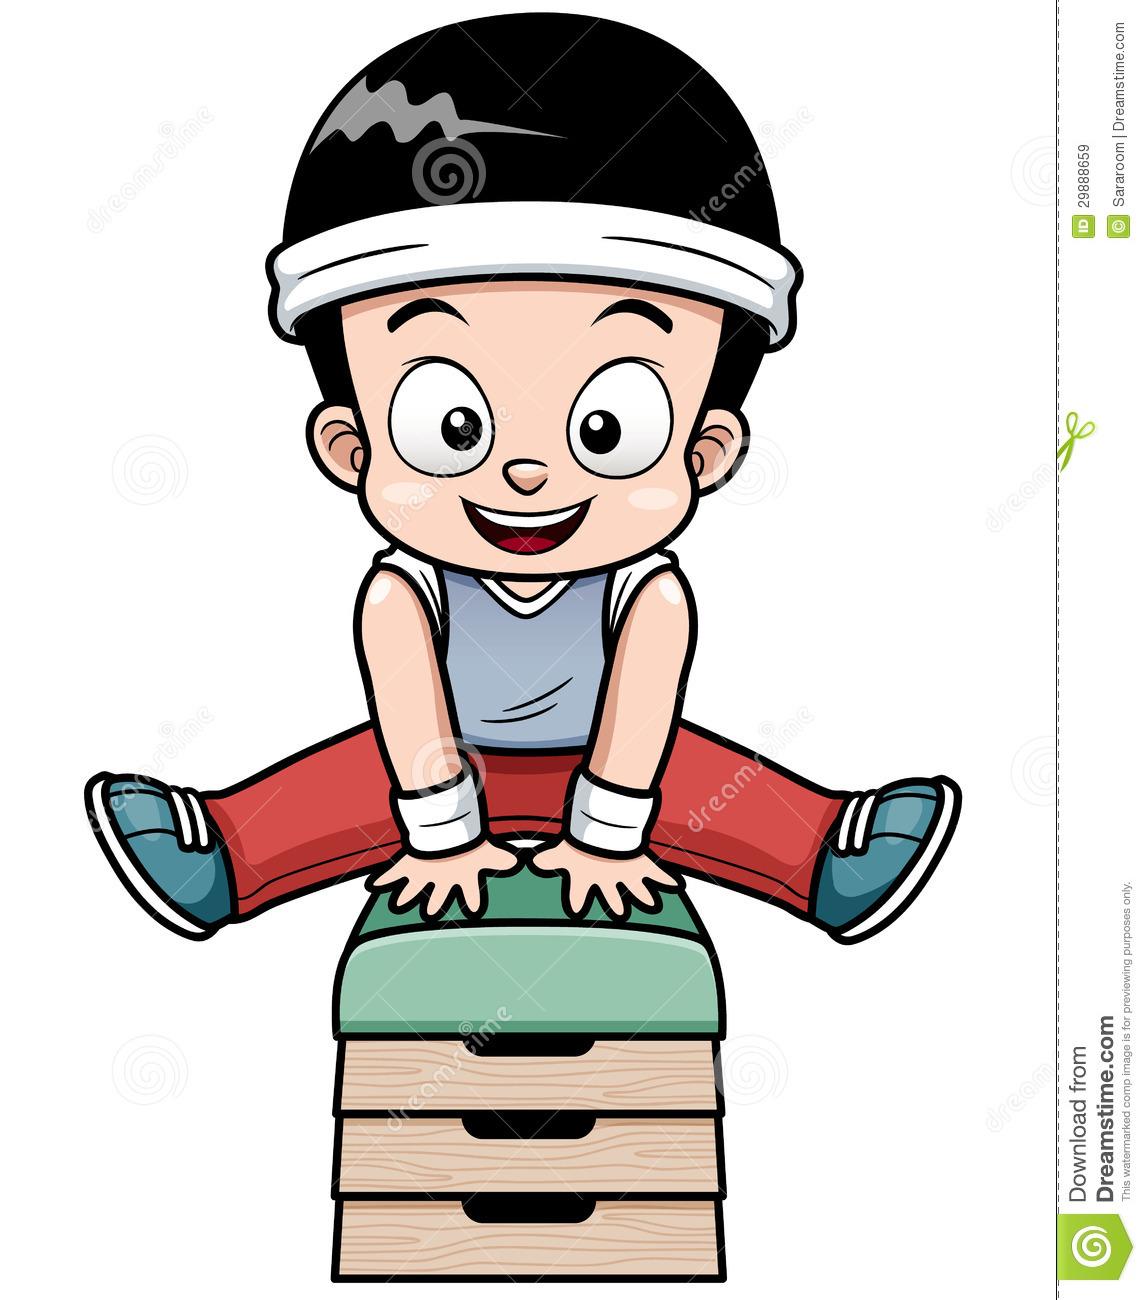 1146x1300 Gymnastics Cartoon Clipart